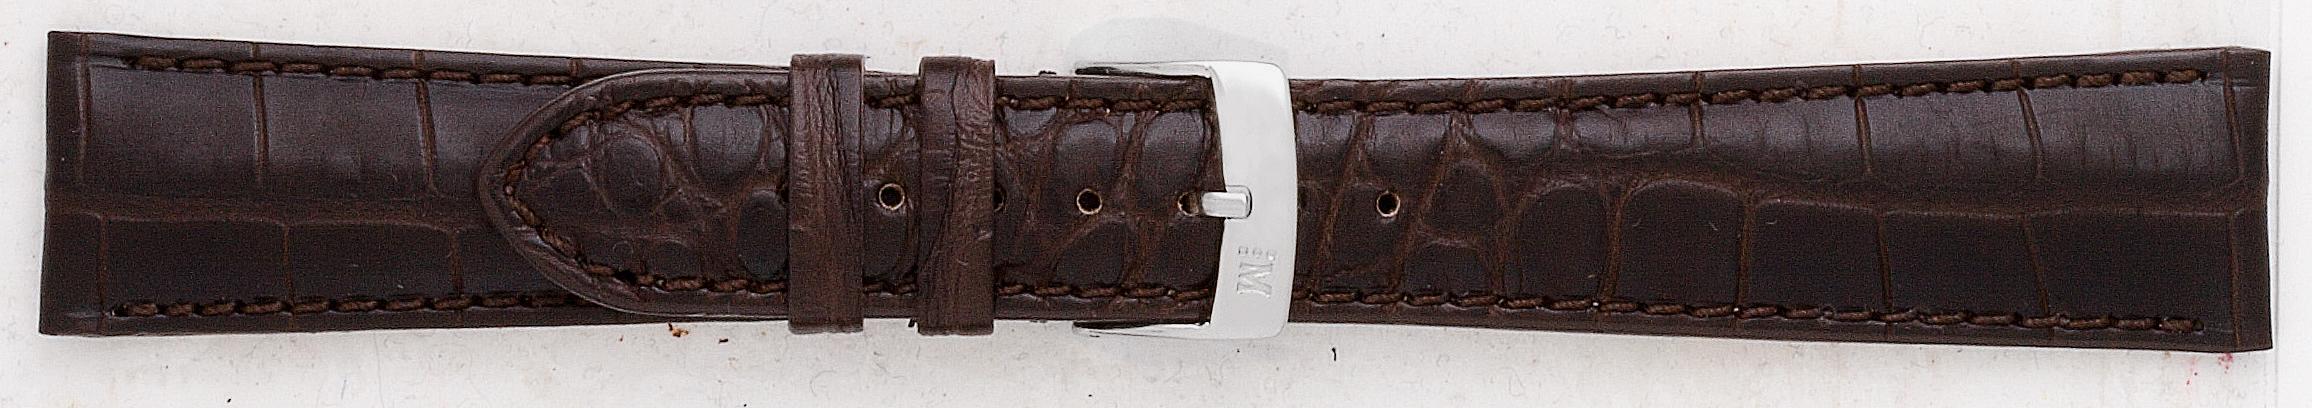 Morellato horlogeband Amadeus G.Croc Mat U0518339030CR22 / PMU030AMADEA22 Krokodillenleer Donkerbruin 22mm + standaard stiksel